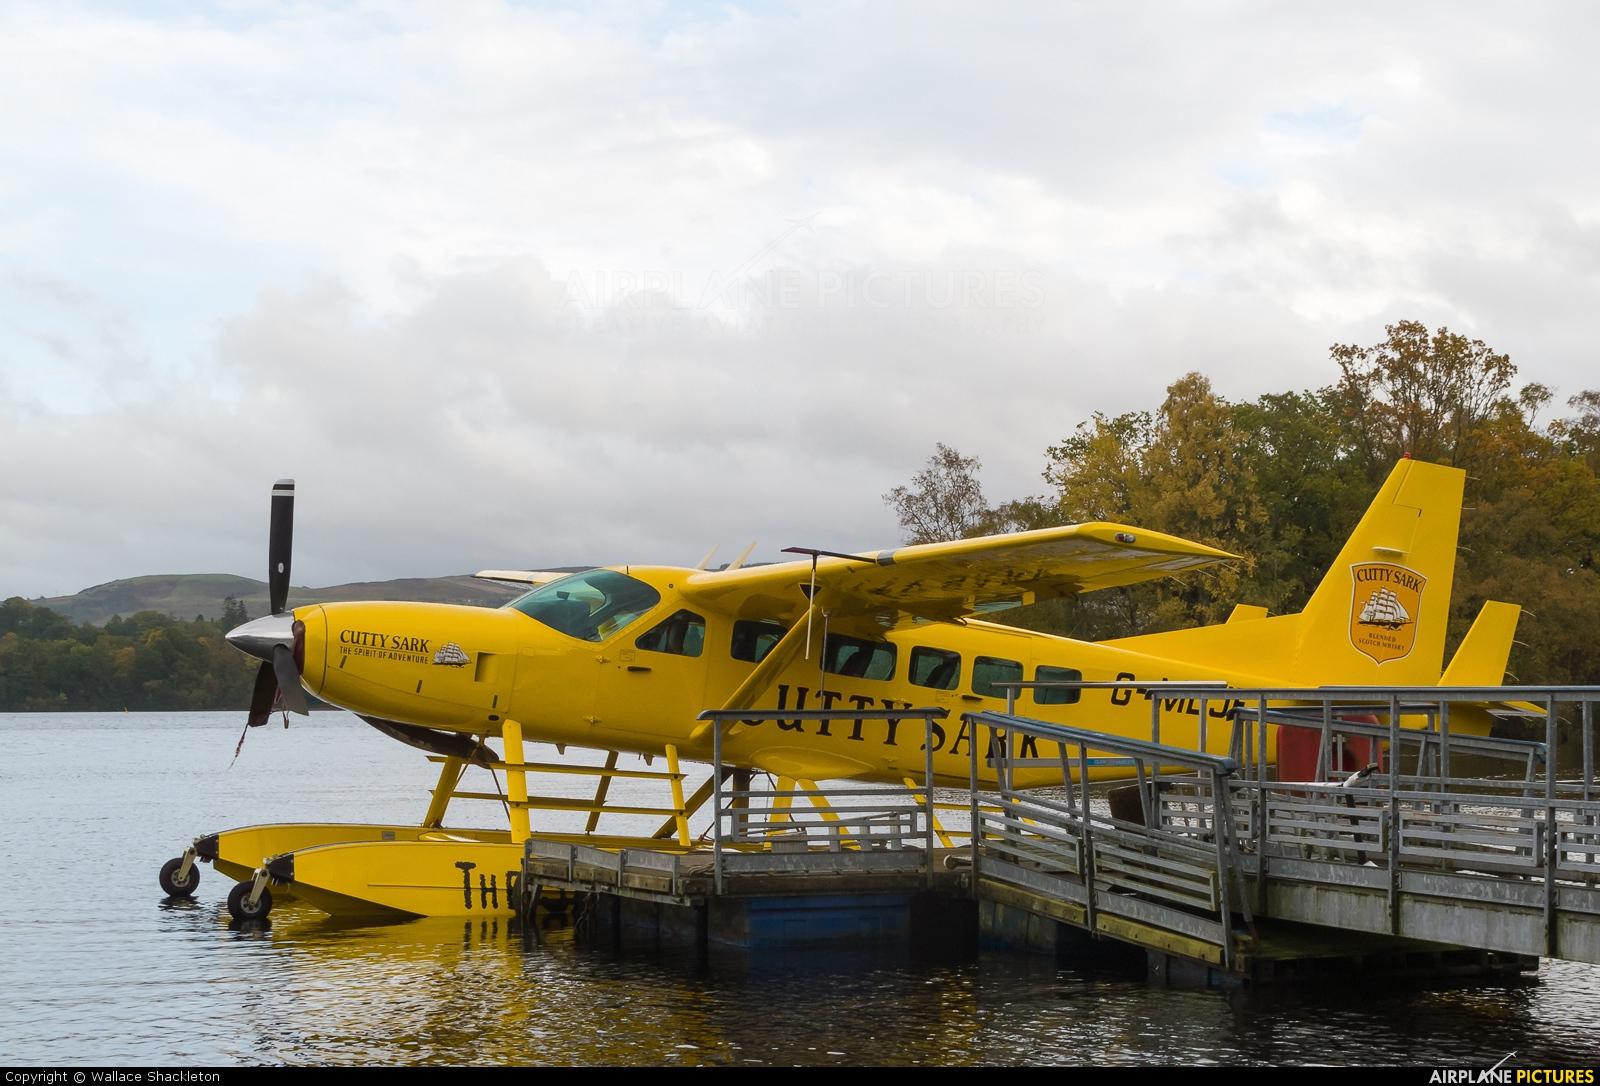 G-MDJE - Loch Lomond Seaplanes Cessna 208 Caravan at Off Airport